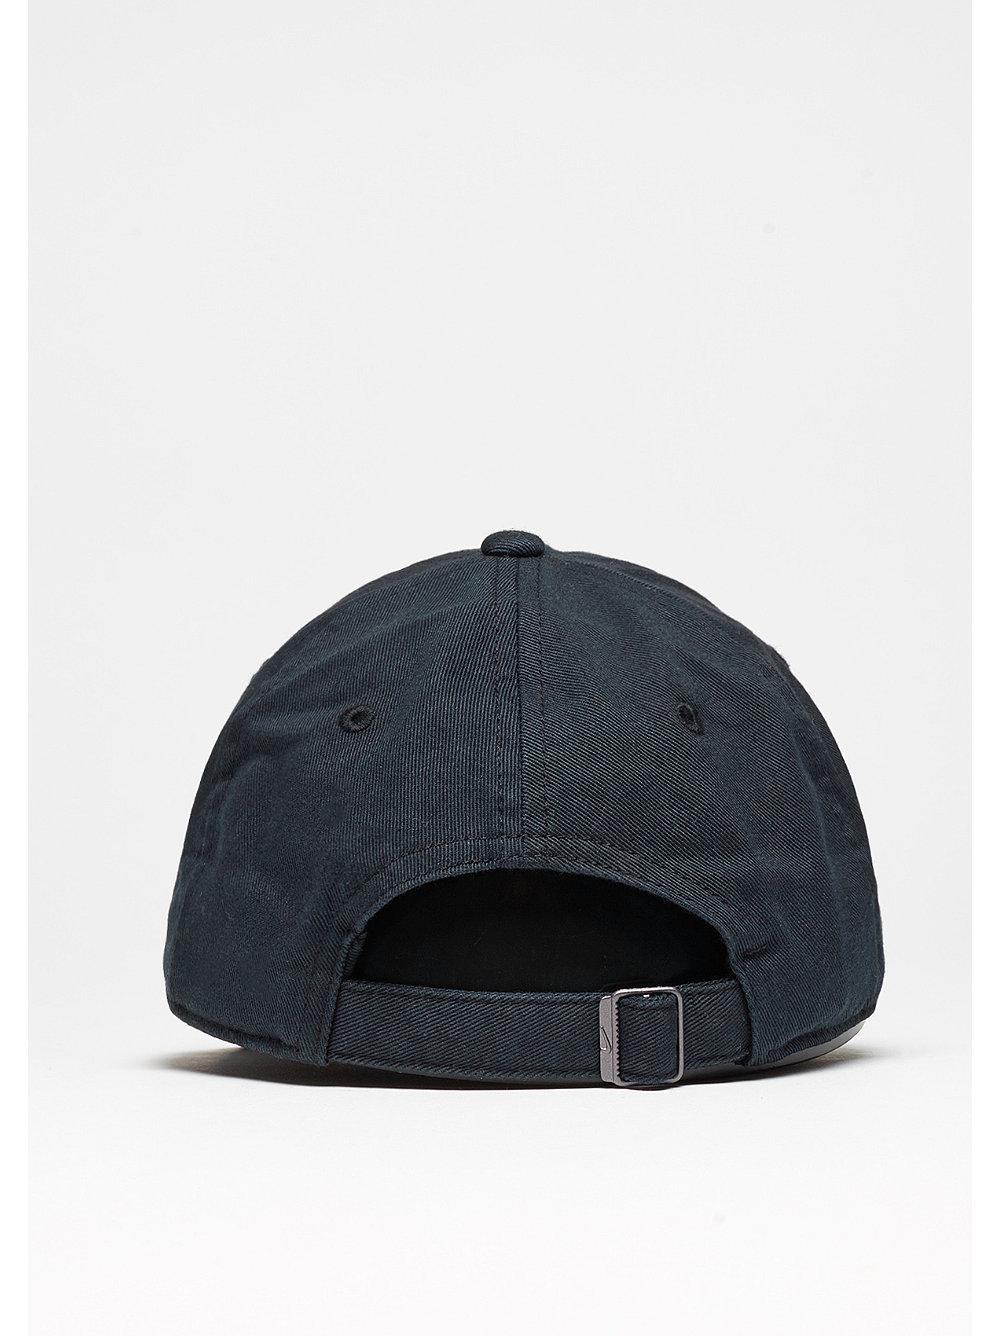 nike baseball cap twill h86 blue black white bei snipes. Black Bedroom Furniture Sets. Home Design Ideas